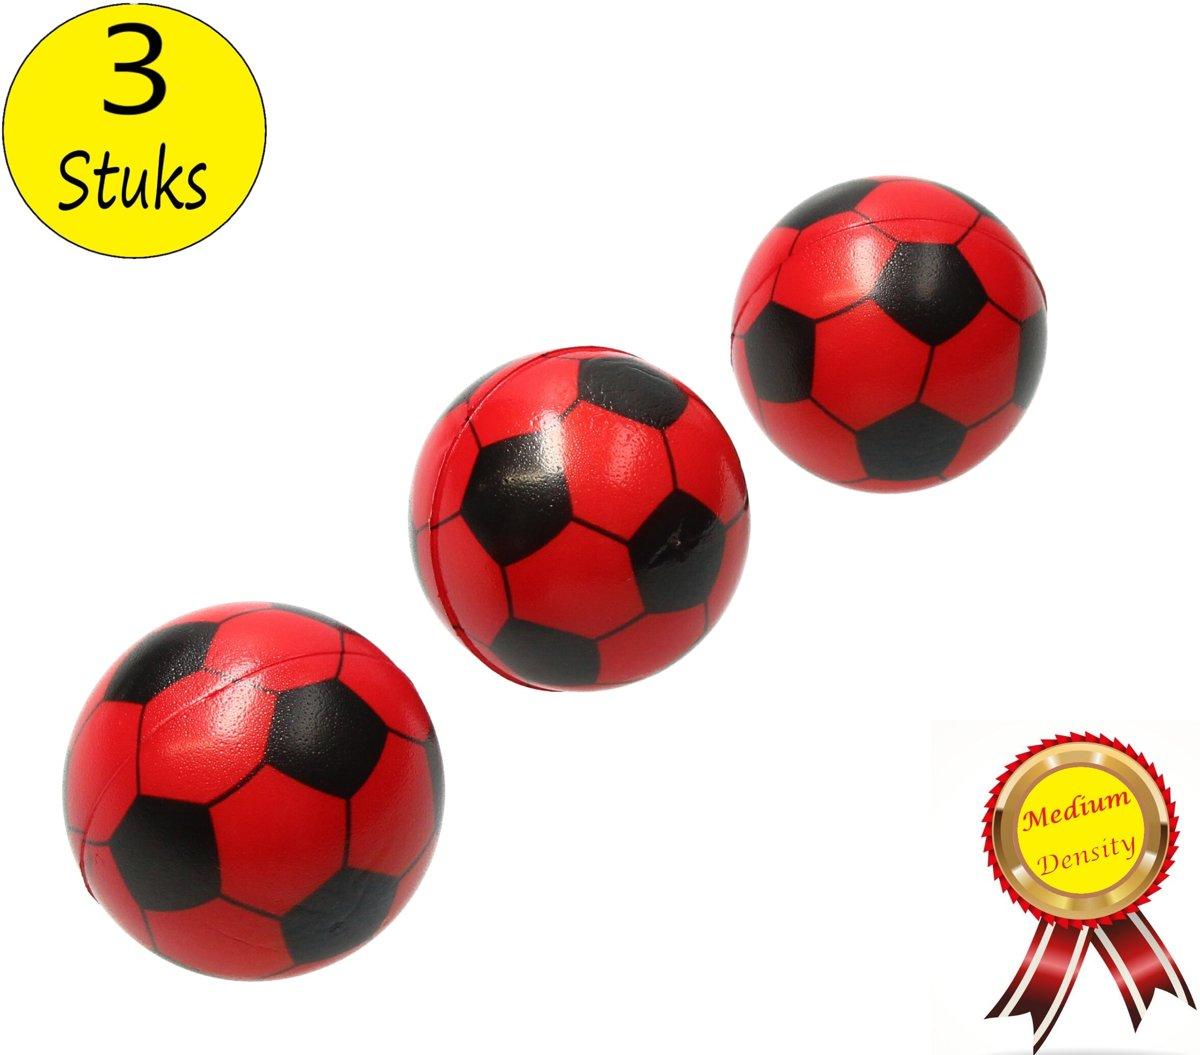 Stressbal Medium Density Voetbal 3 Stuks – Sensomotorische Stimulatie – Anti-Stress – Rood